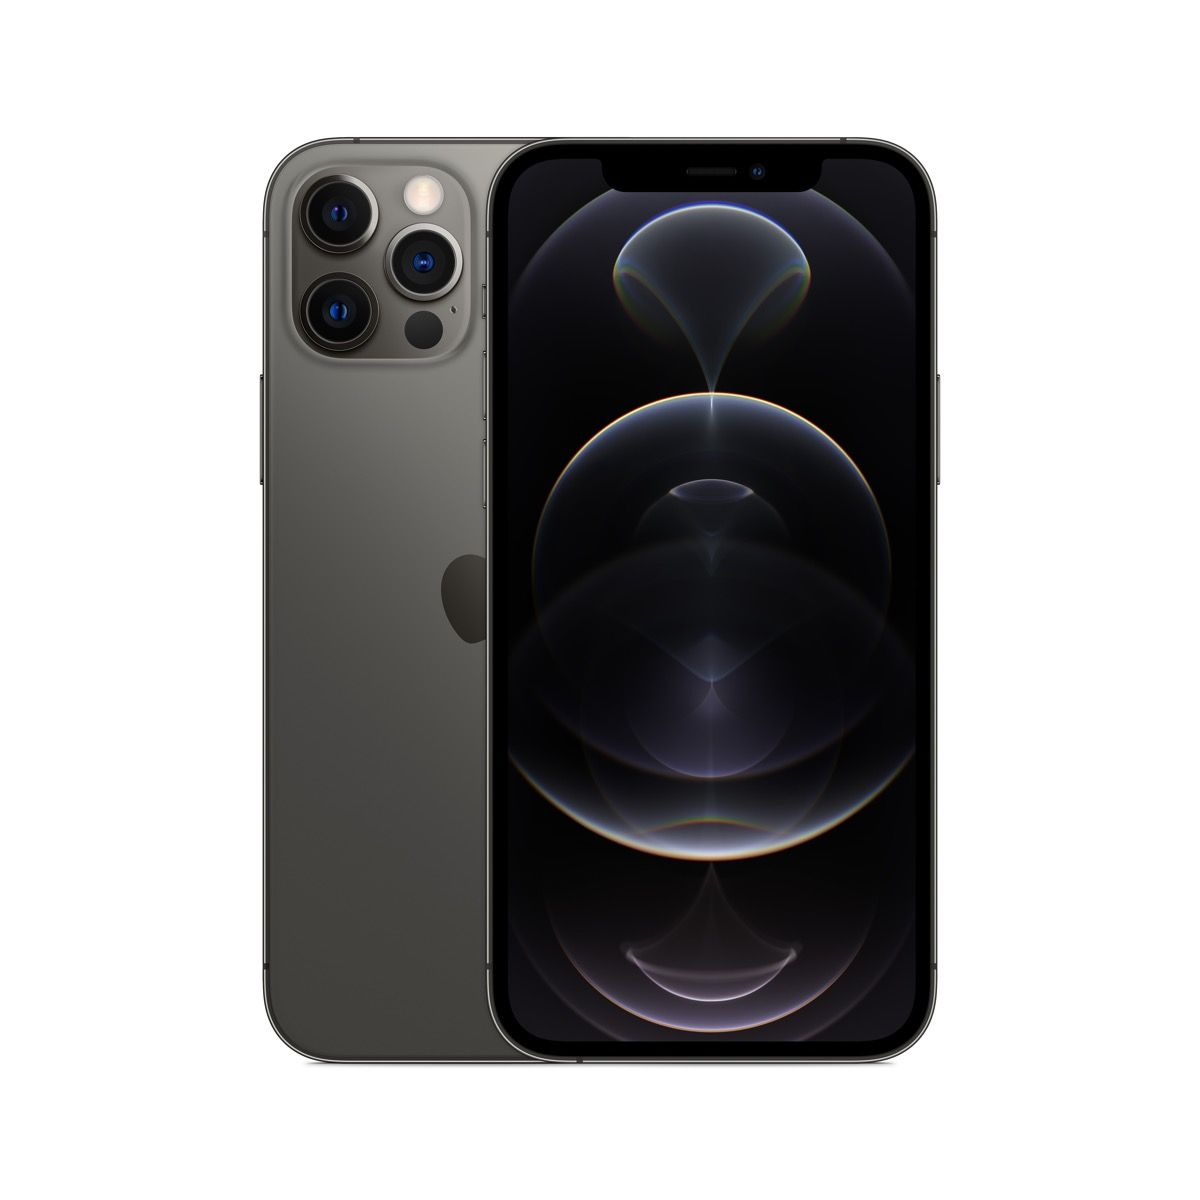 Apple iPhone 12 Pro 512GB Graphite / SK